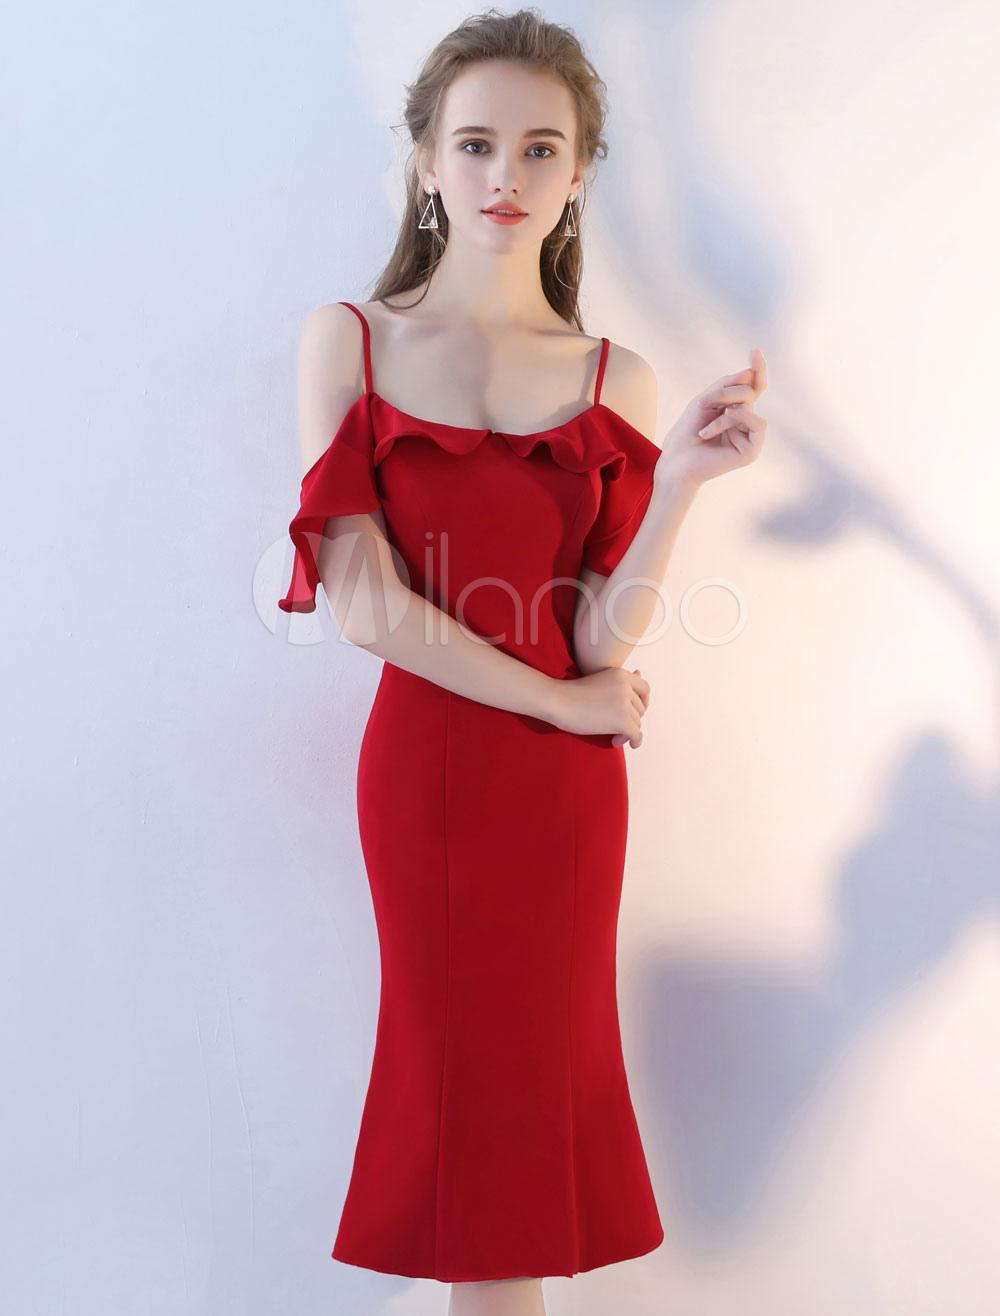 Cocktail Dresses Sheath Column Off The Shoulder Ruffles Burgundy Satin Knee Length Short Party Dresses